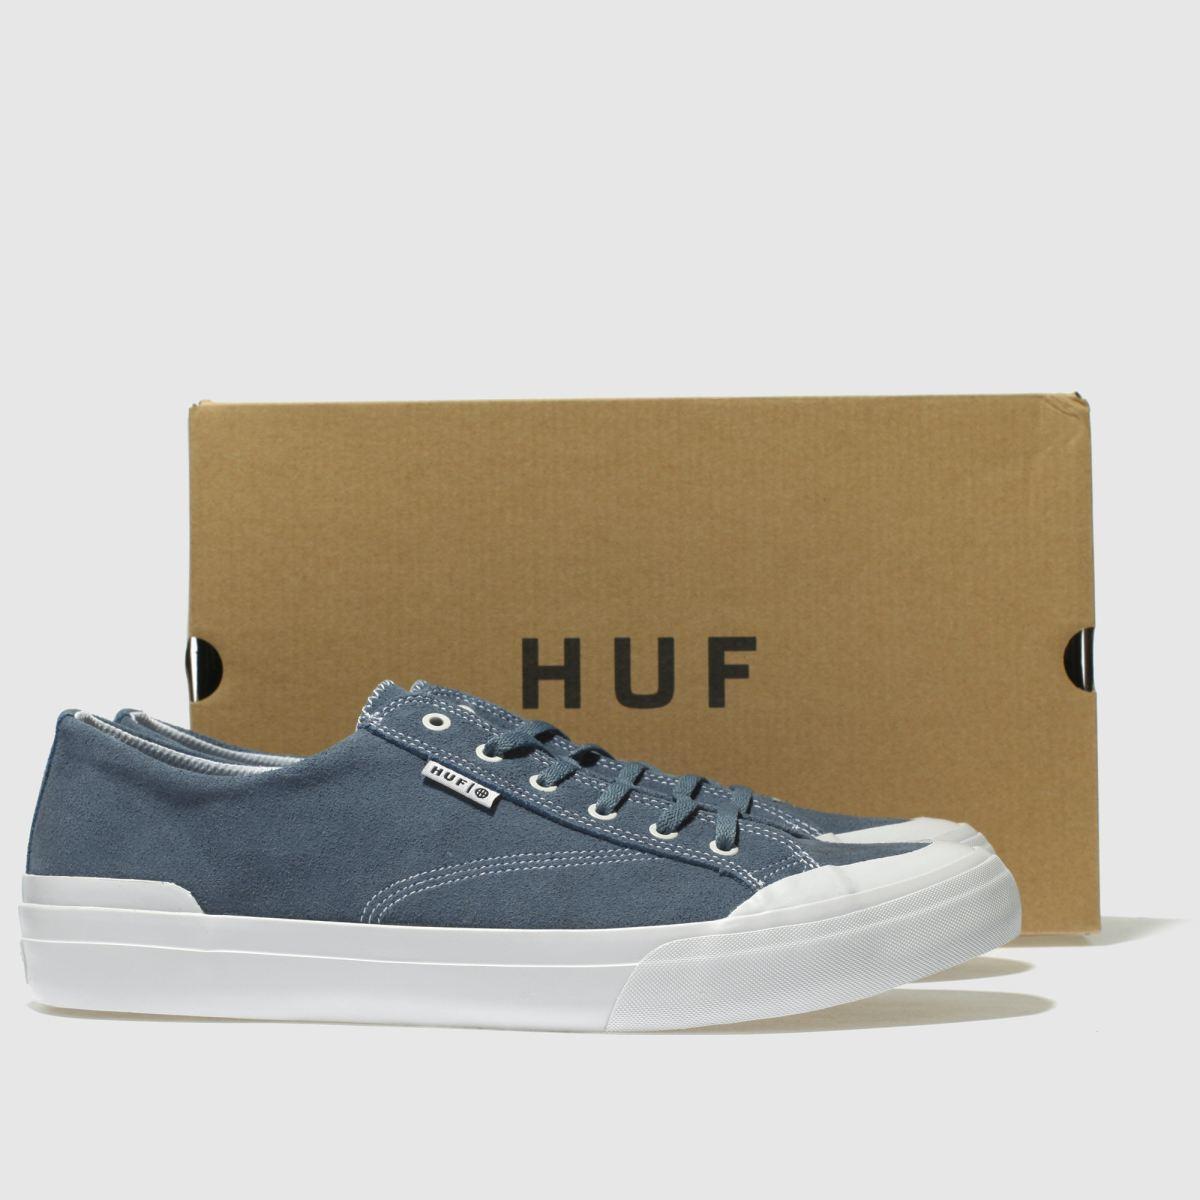 Herren Blau huf Classic Lo Sneaker | Schuhe schuh Gute Qualität beliebte Schuhe | c6f4bc